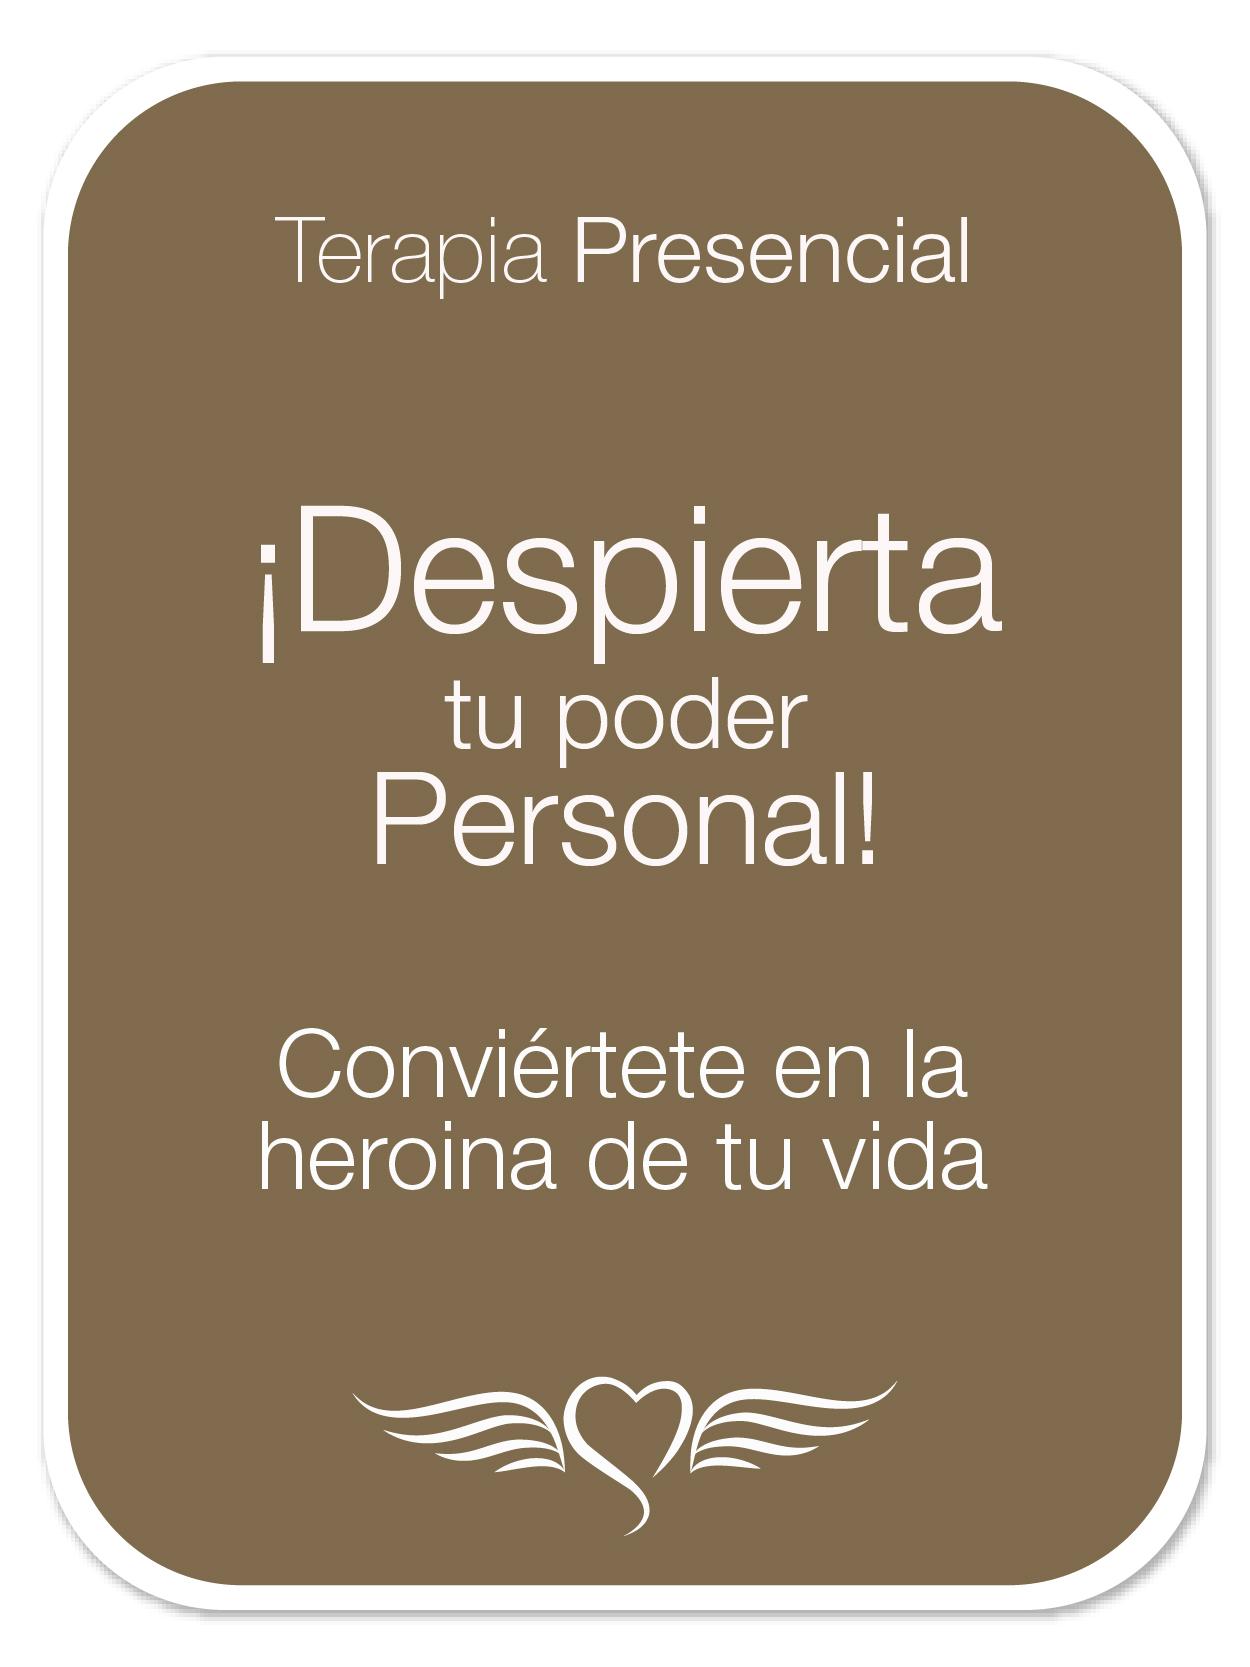 despierta-tu-poder-personal-elvira-muliterno-mujer-empoderamiento-empowermente-jefa-autoridad-poder-femenino-terapia